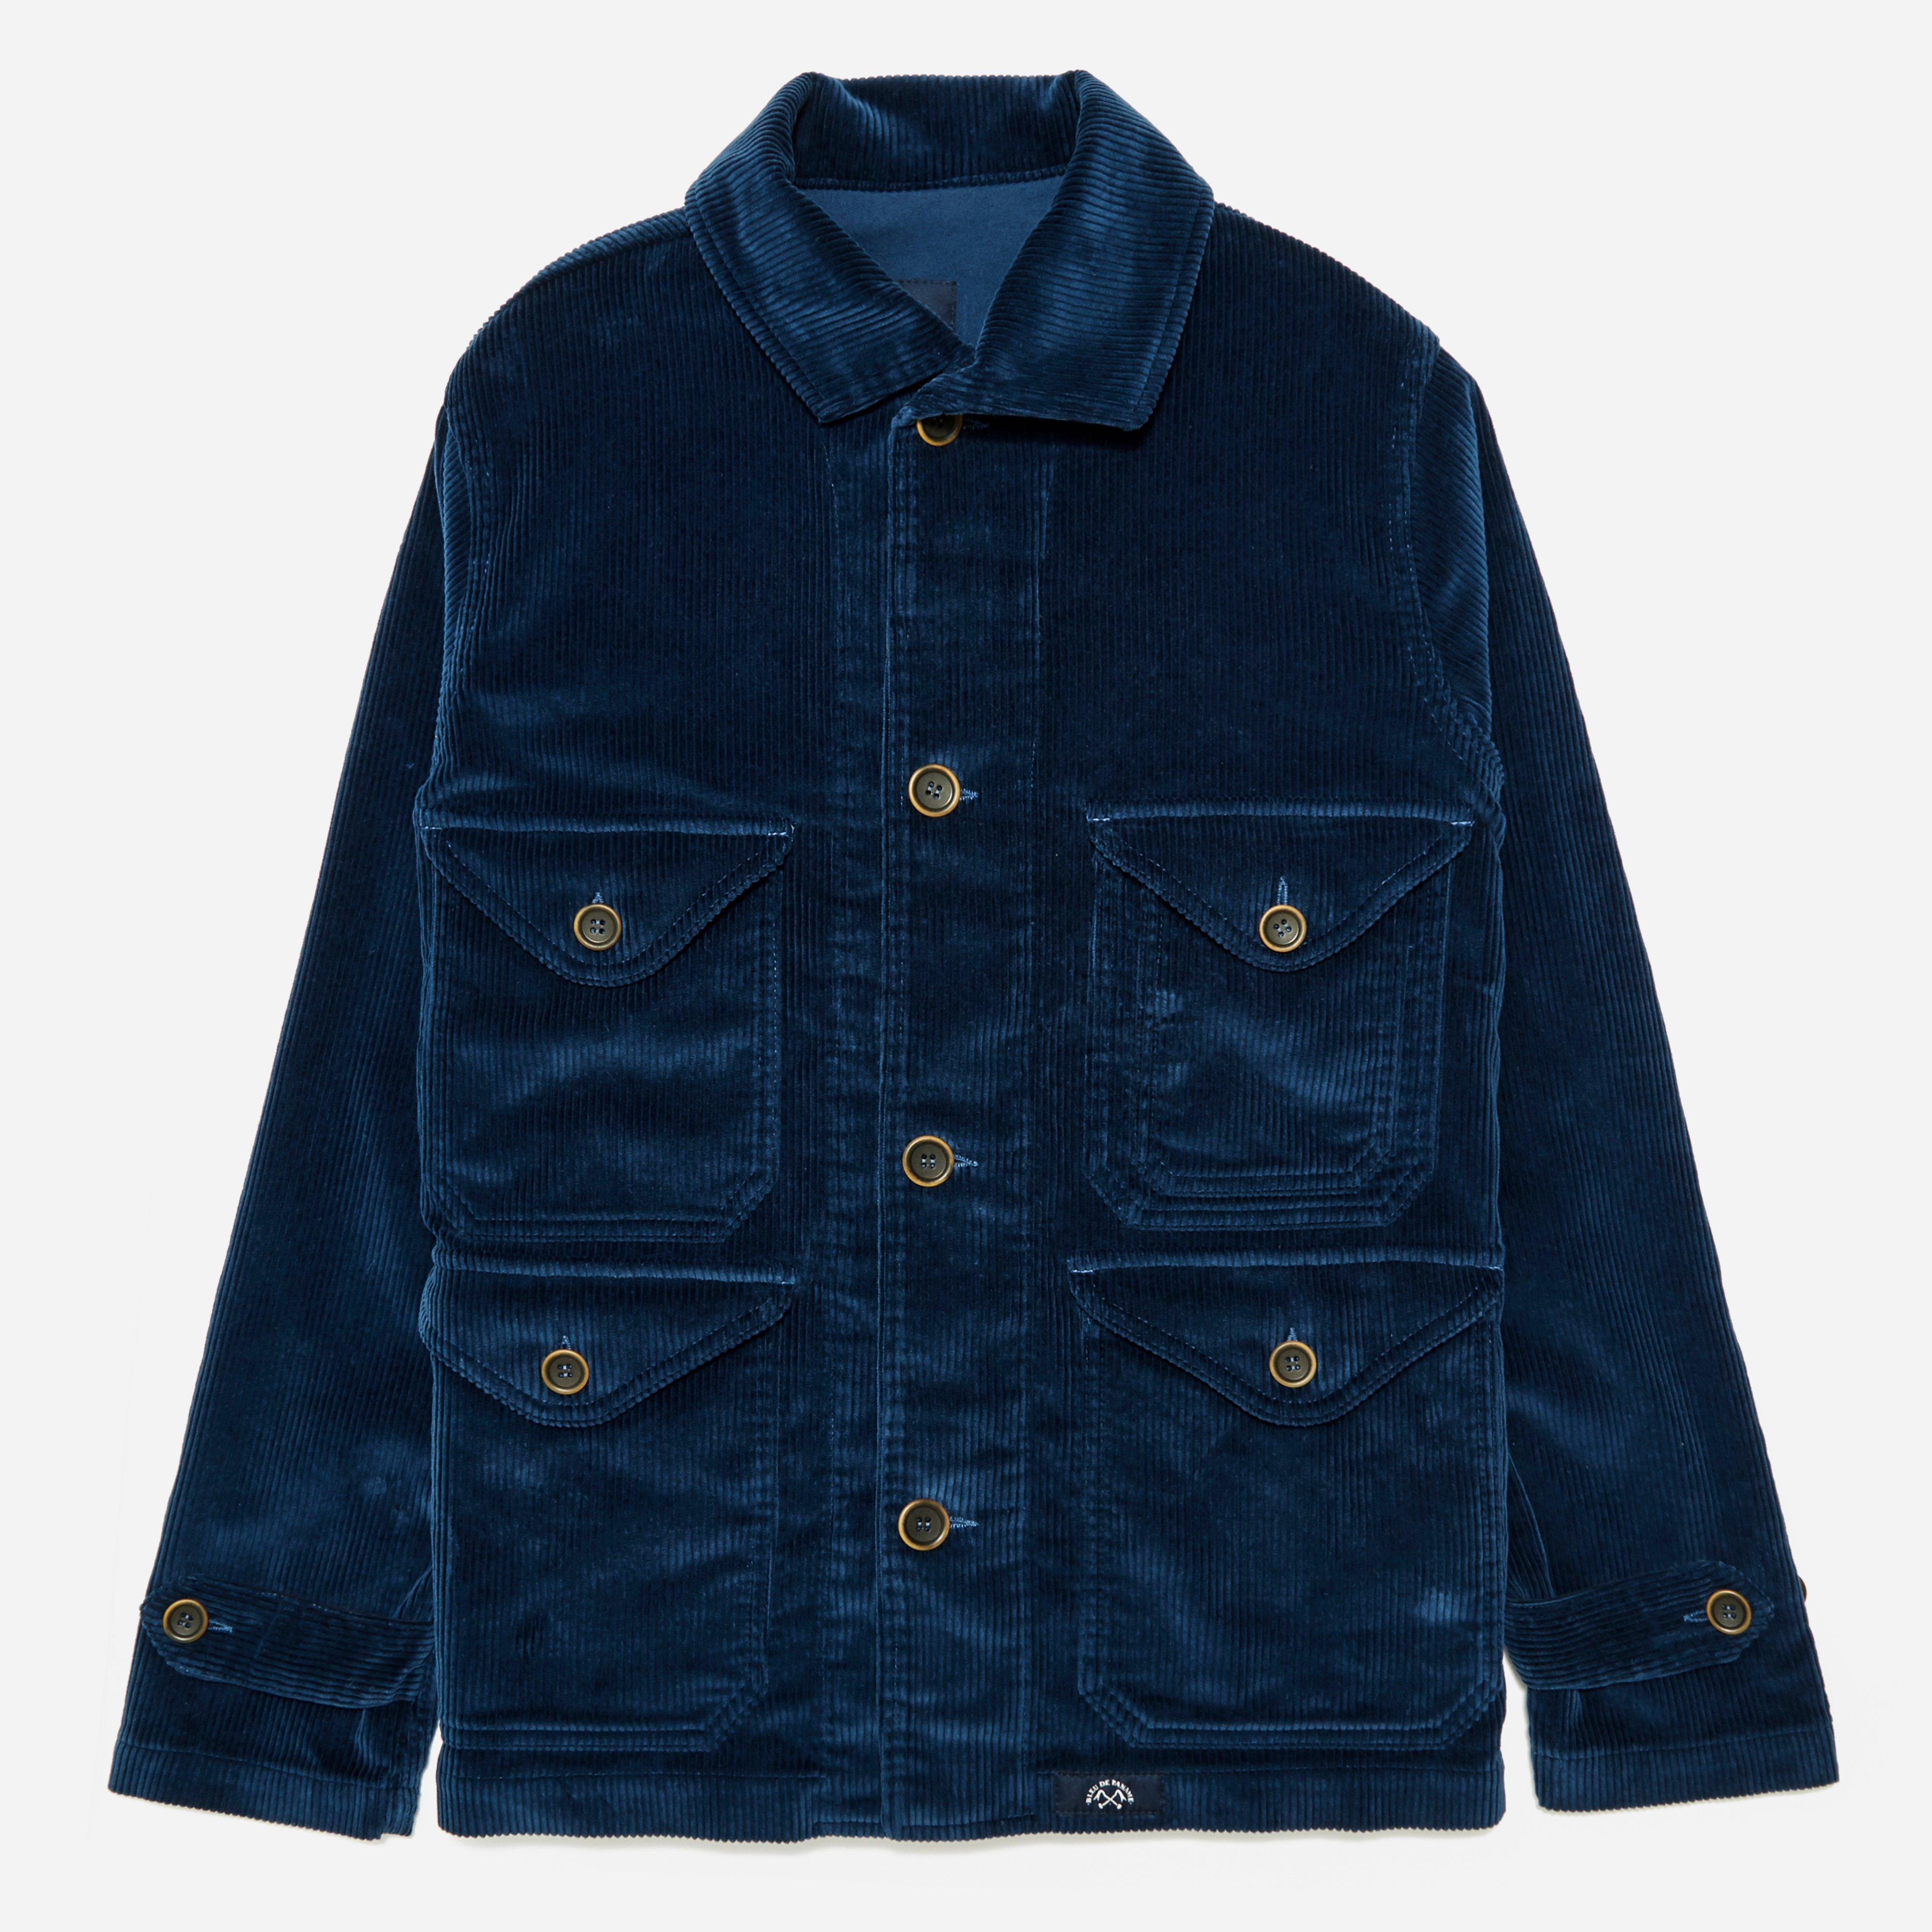 Bleu De Paname Corduroy Hunting Jacket